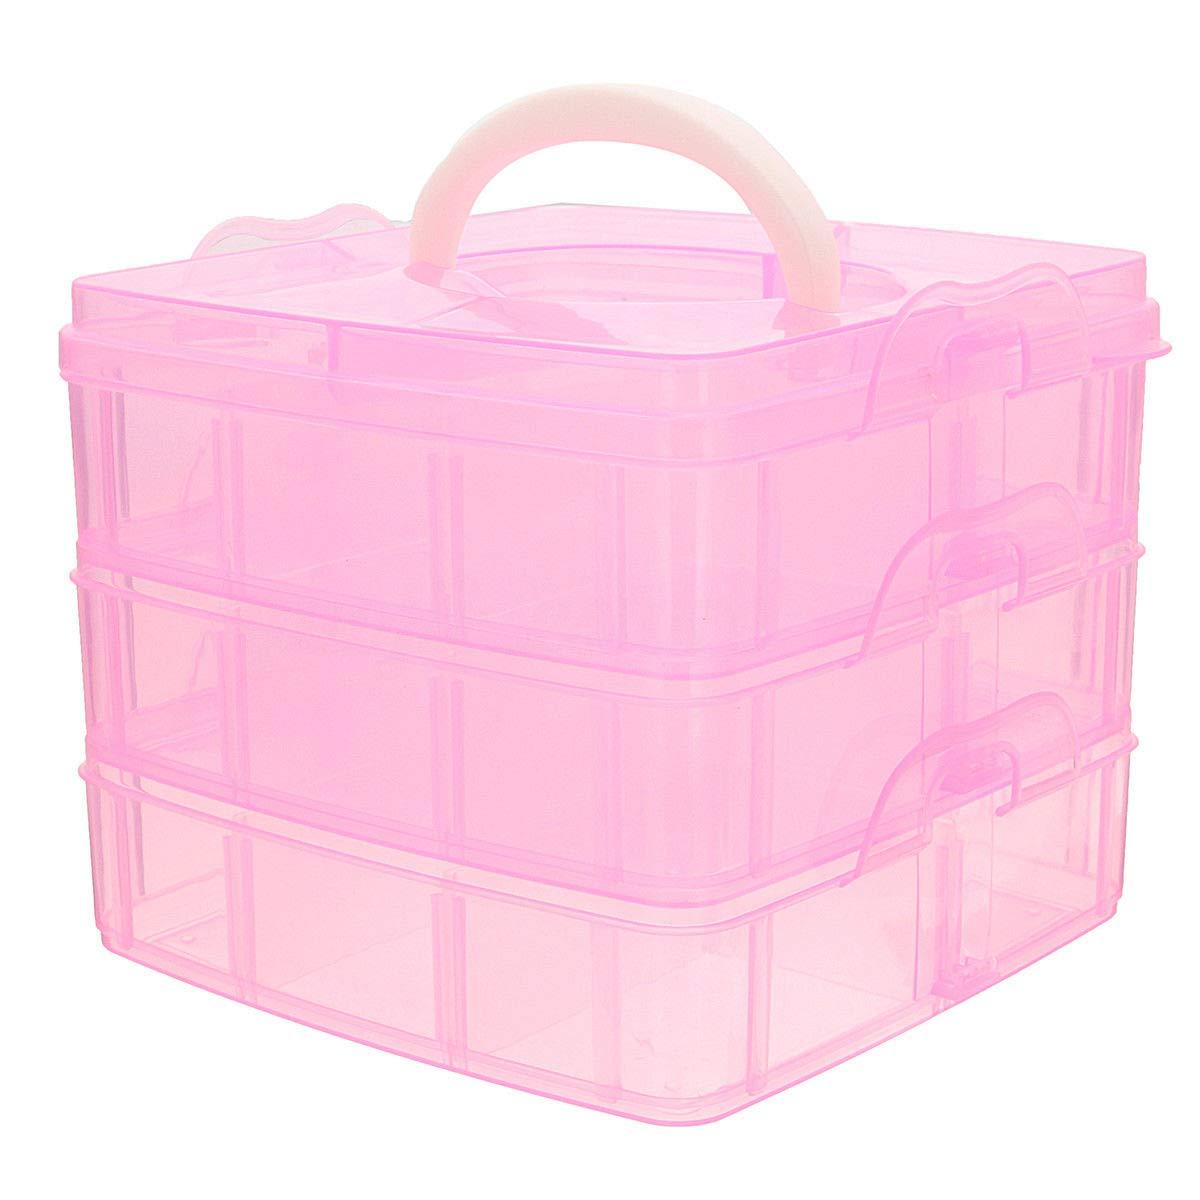 FidgetFidget Storage Box Pink